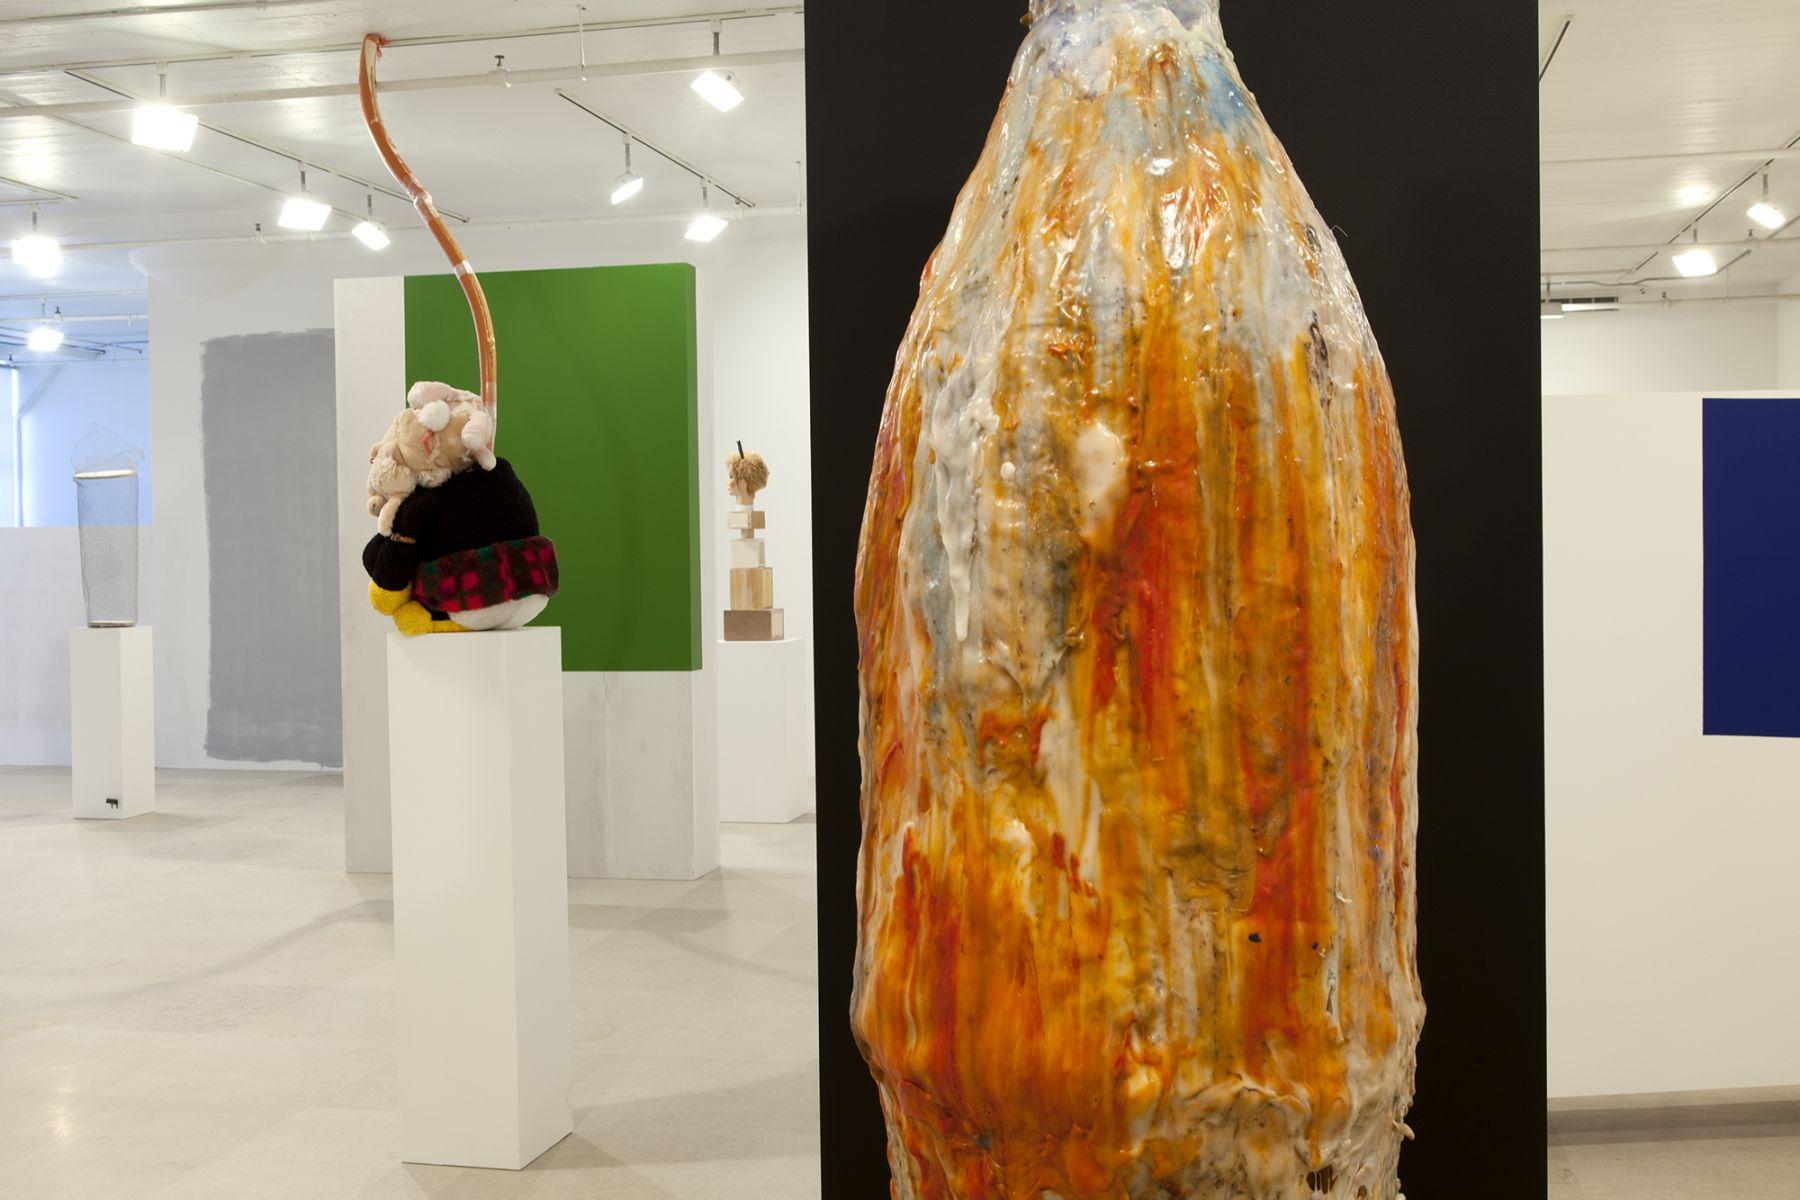 Gelitin, Installation view, The Fall Show, Greene Naftali, New York, 2012